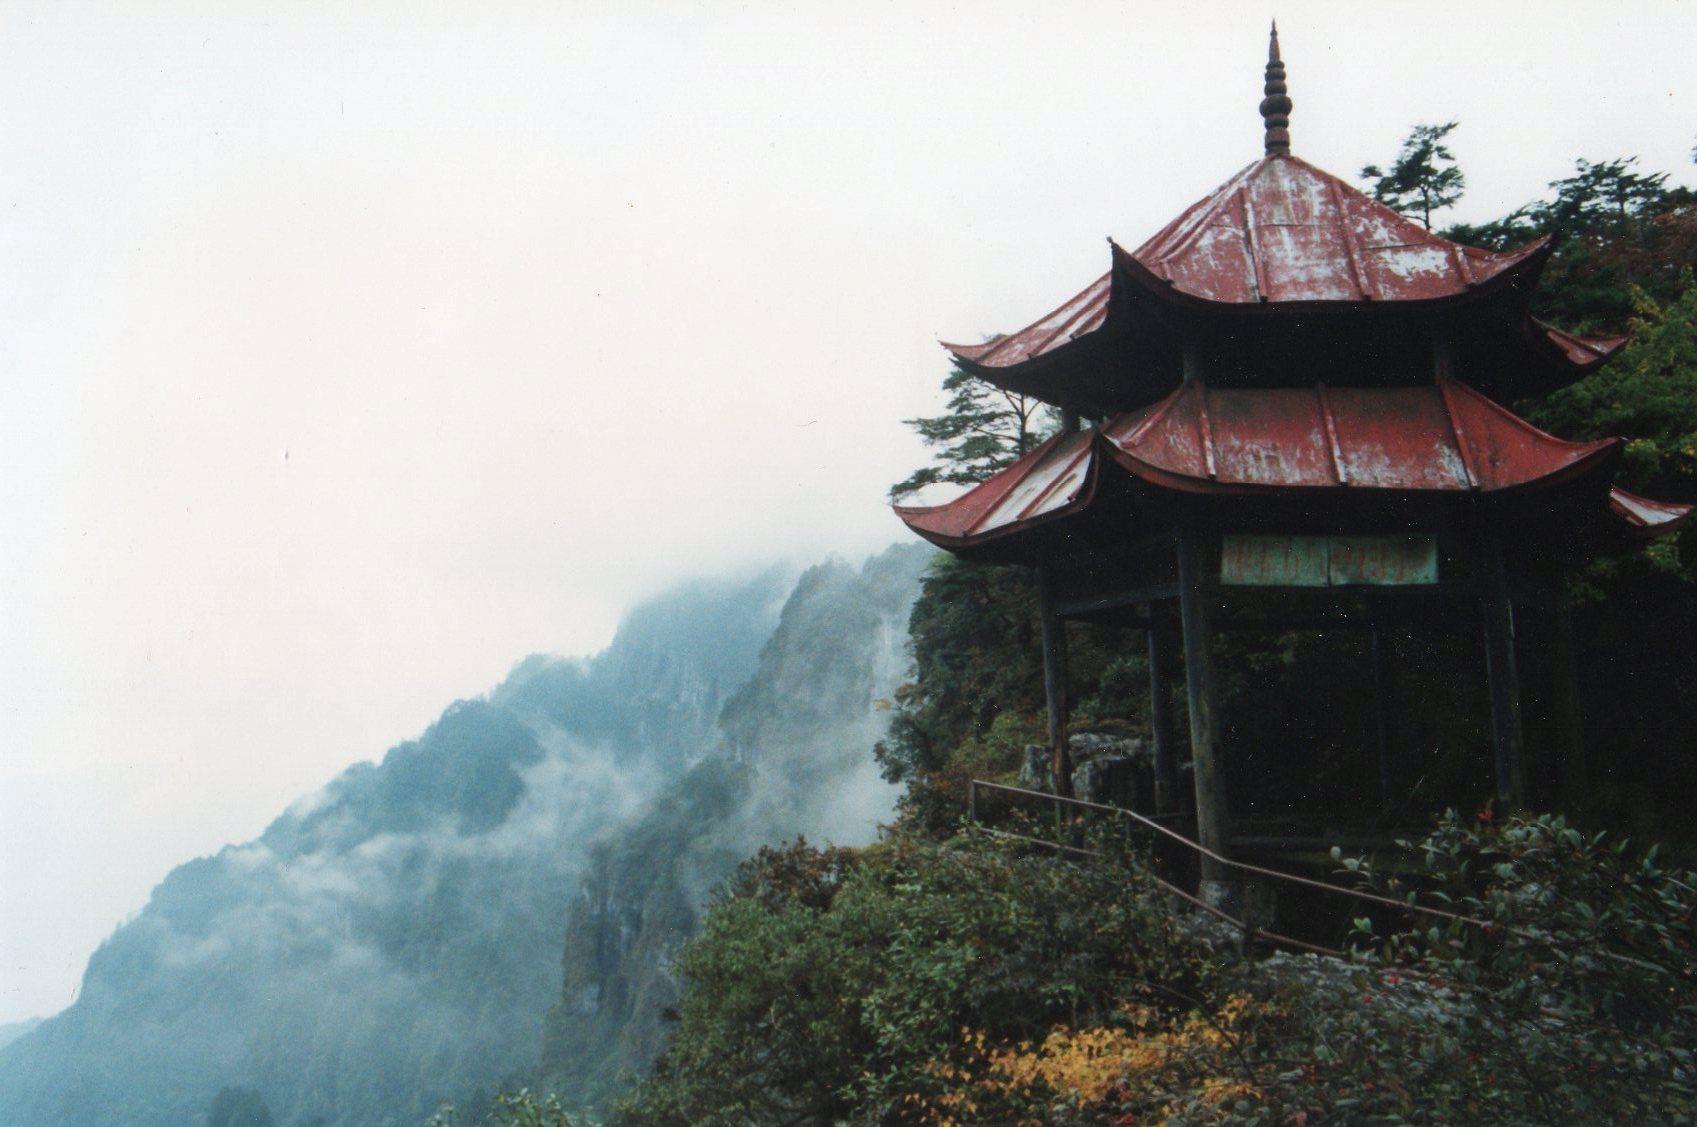 China Sichuan, Emei Shan, Clifftop pavilion, all rust in 1991, Walkopedia